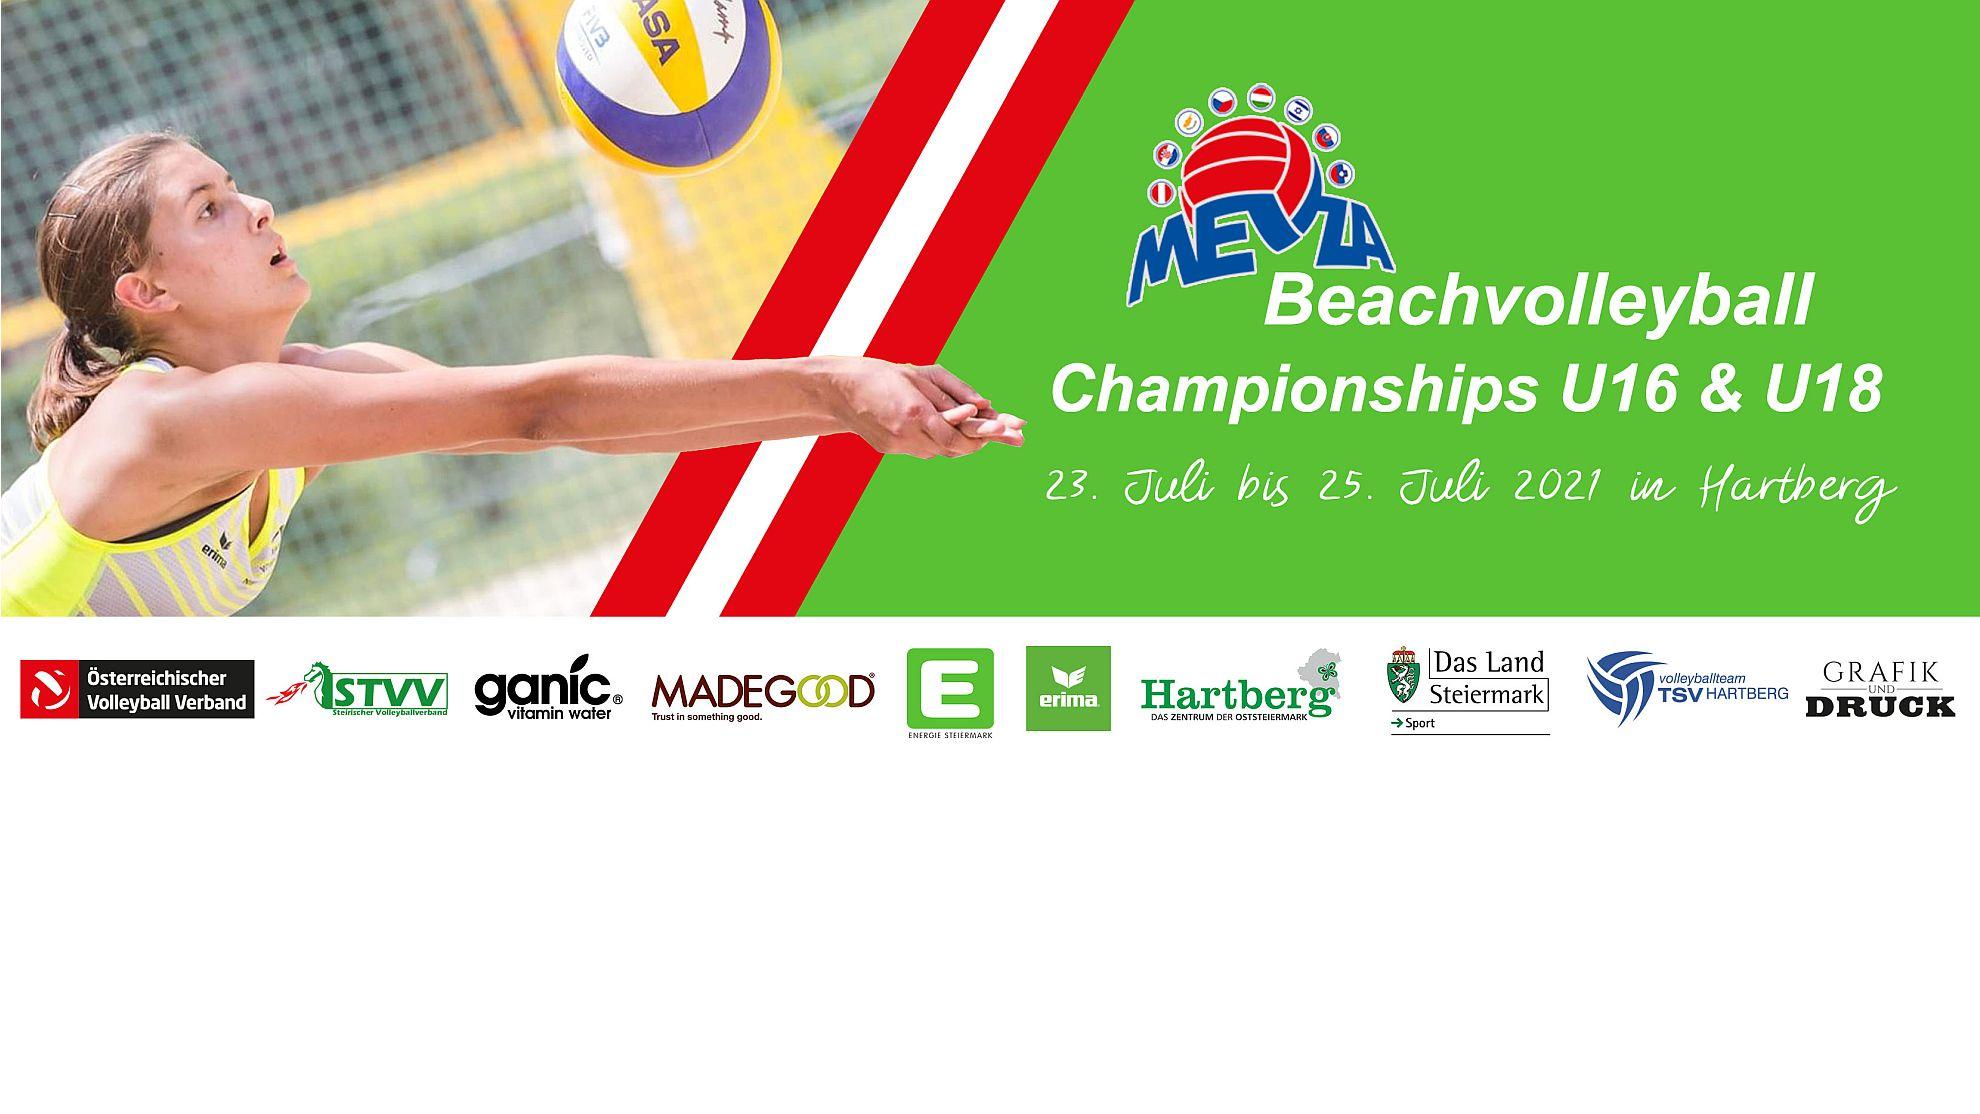 MEVZA Beach Volleyball Champions U16 & U18